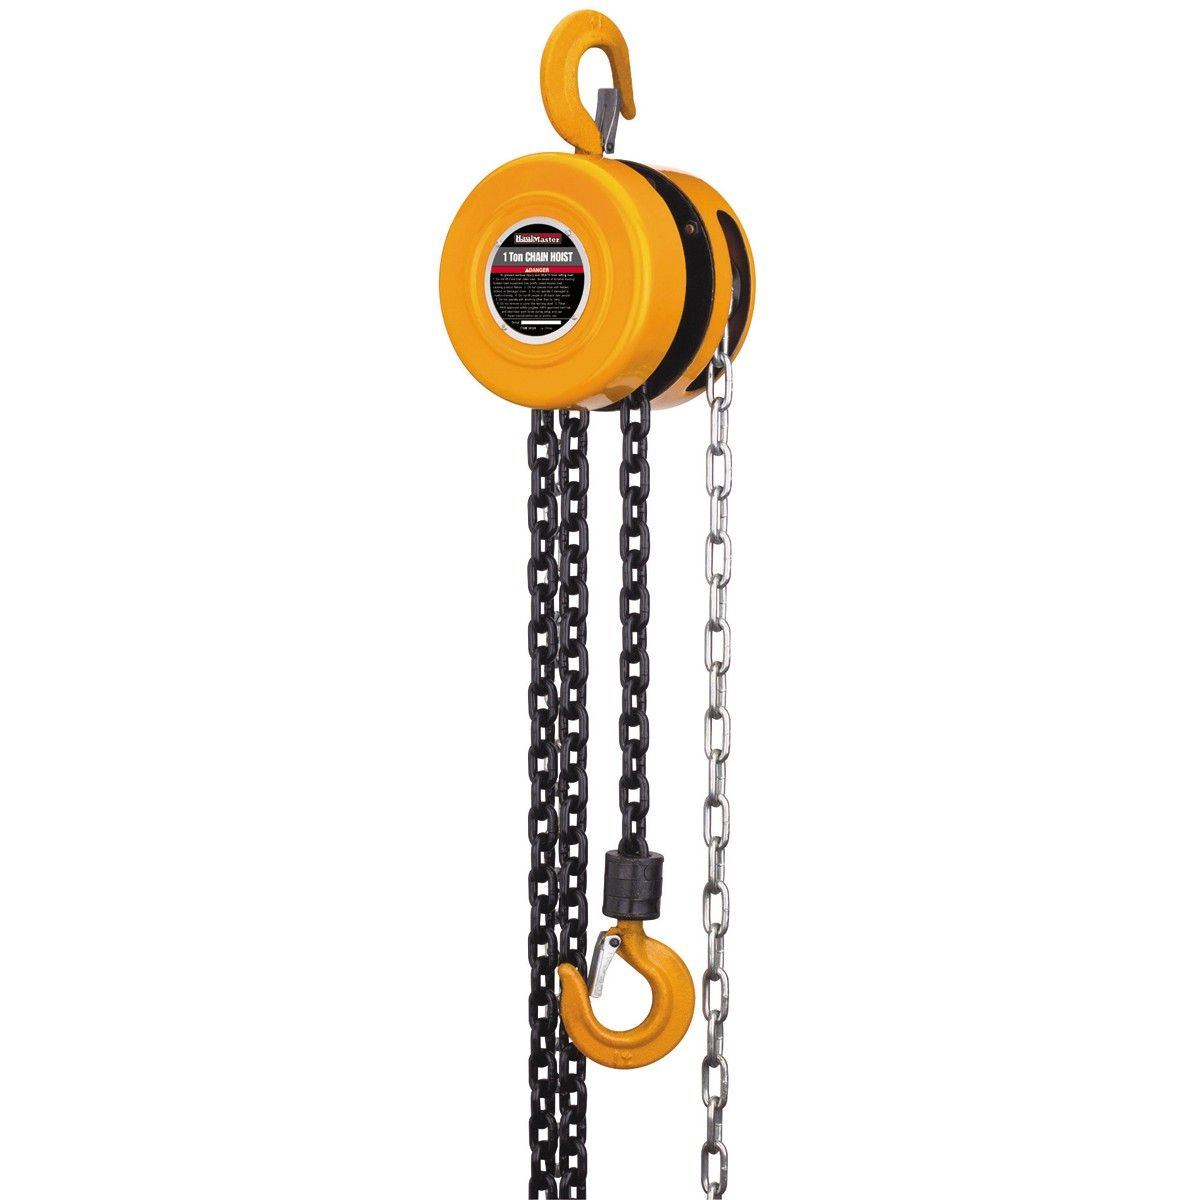 1 Ton Extra Long Lift Manual Chain Hoist Electric Hoists Hoist Gantry Crane